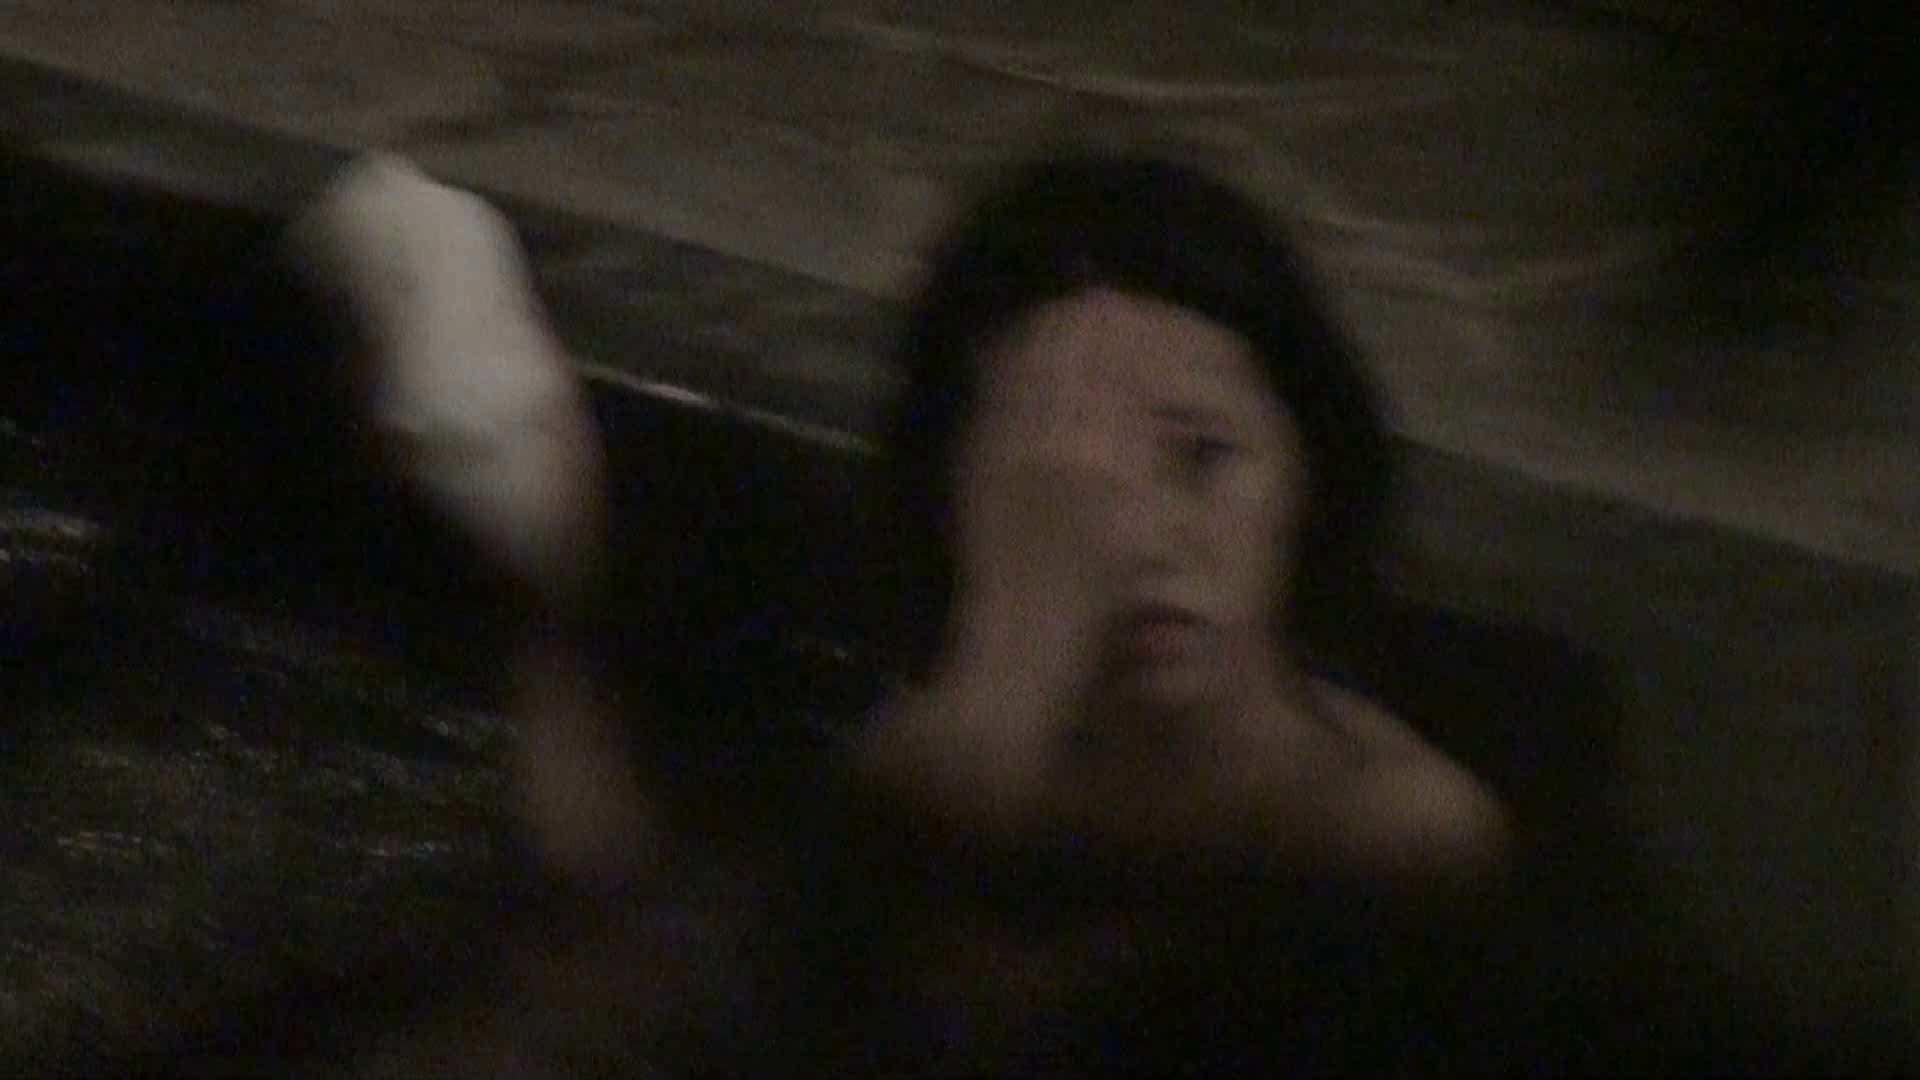 Aquaな露天風呂Vol.358 OLのエロ生活 おまんこ無修正動画無料 50連発 5